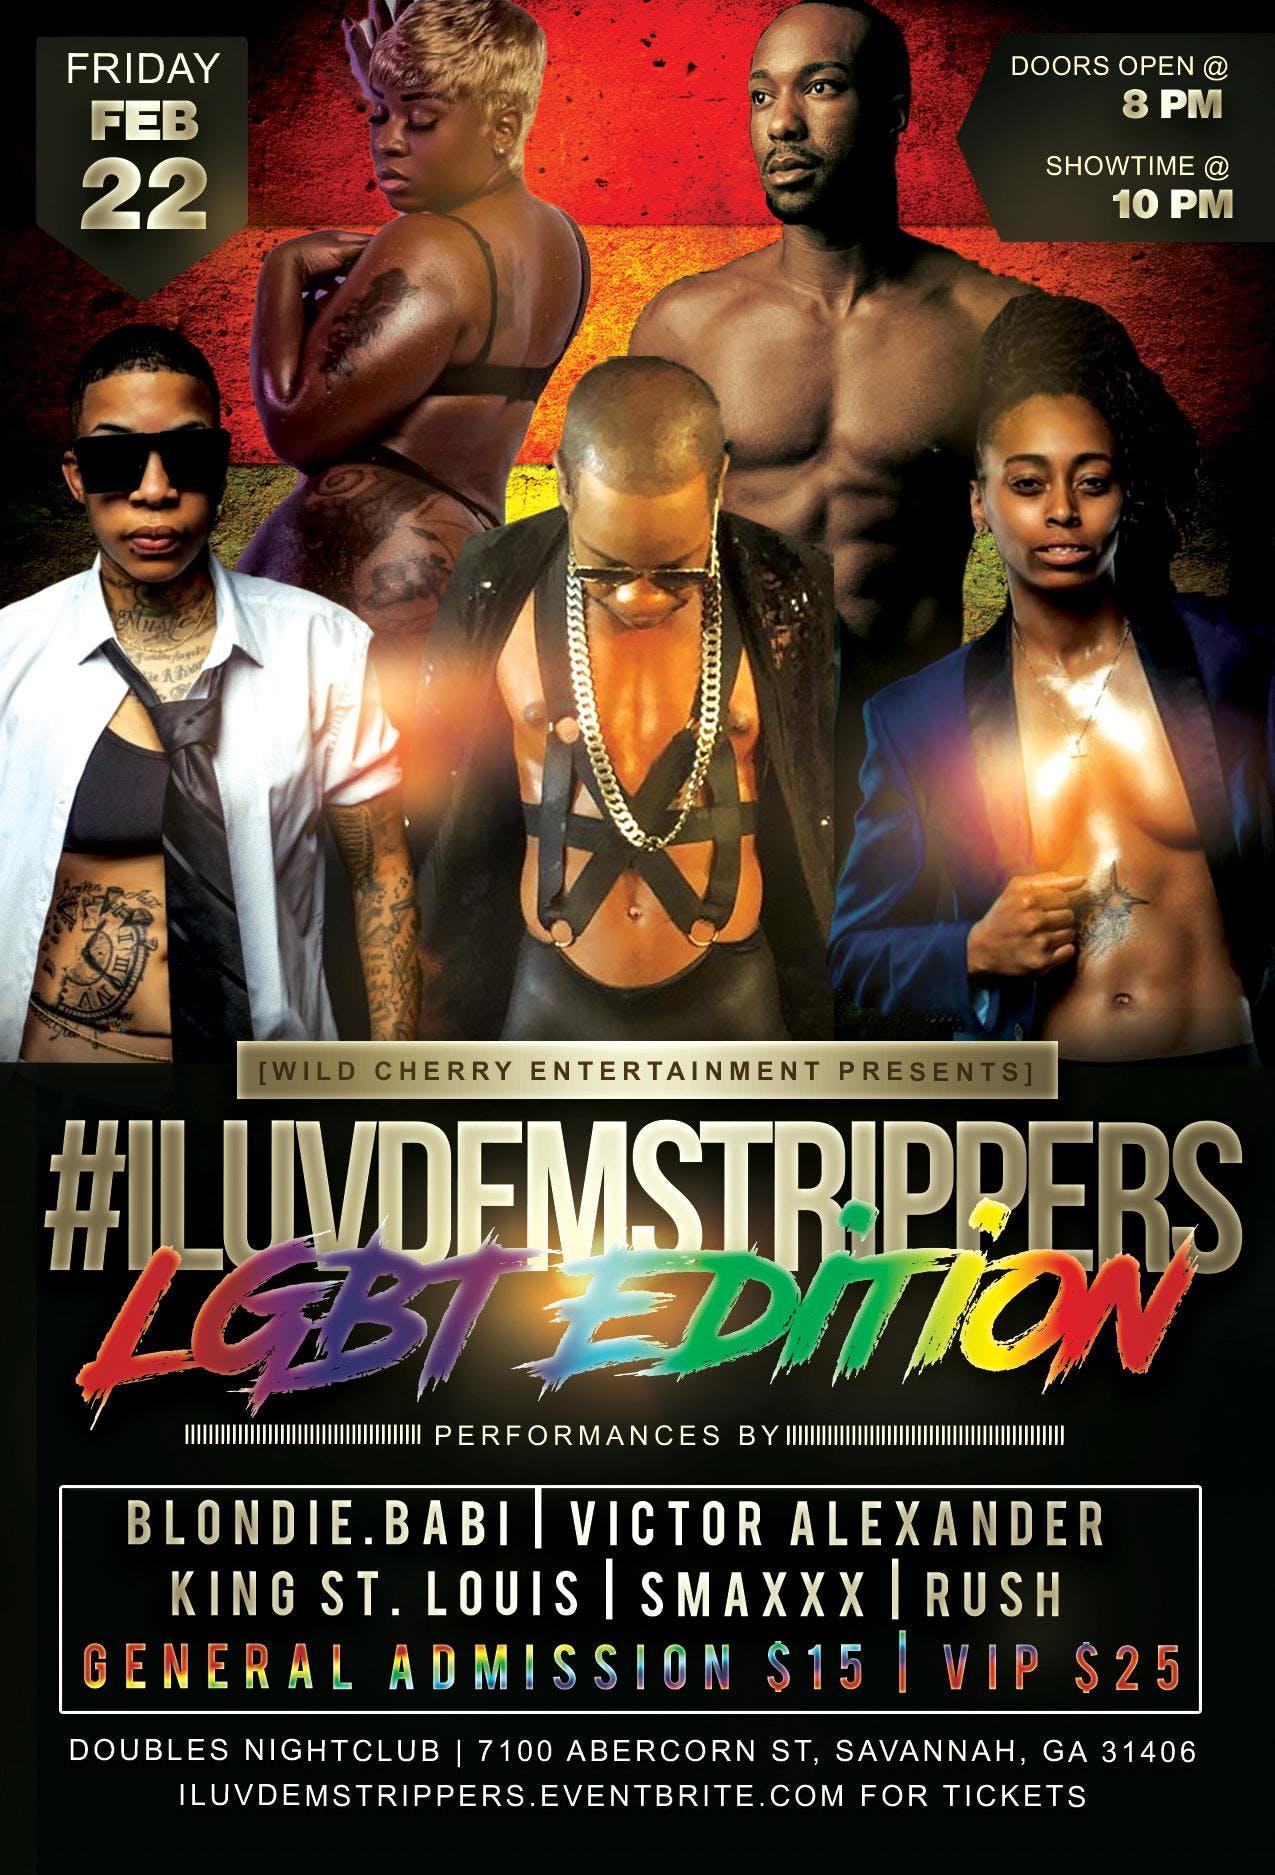 I Luv Dem Strippers LGBT Edition